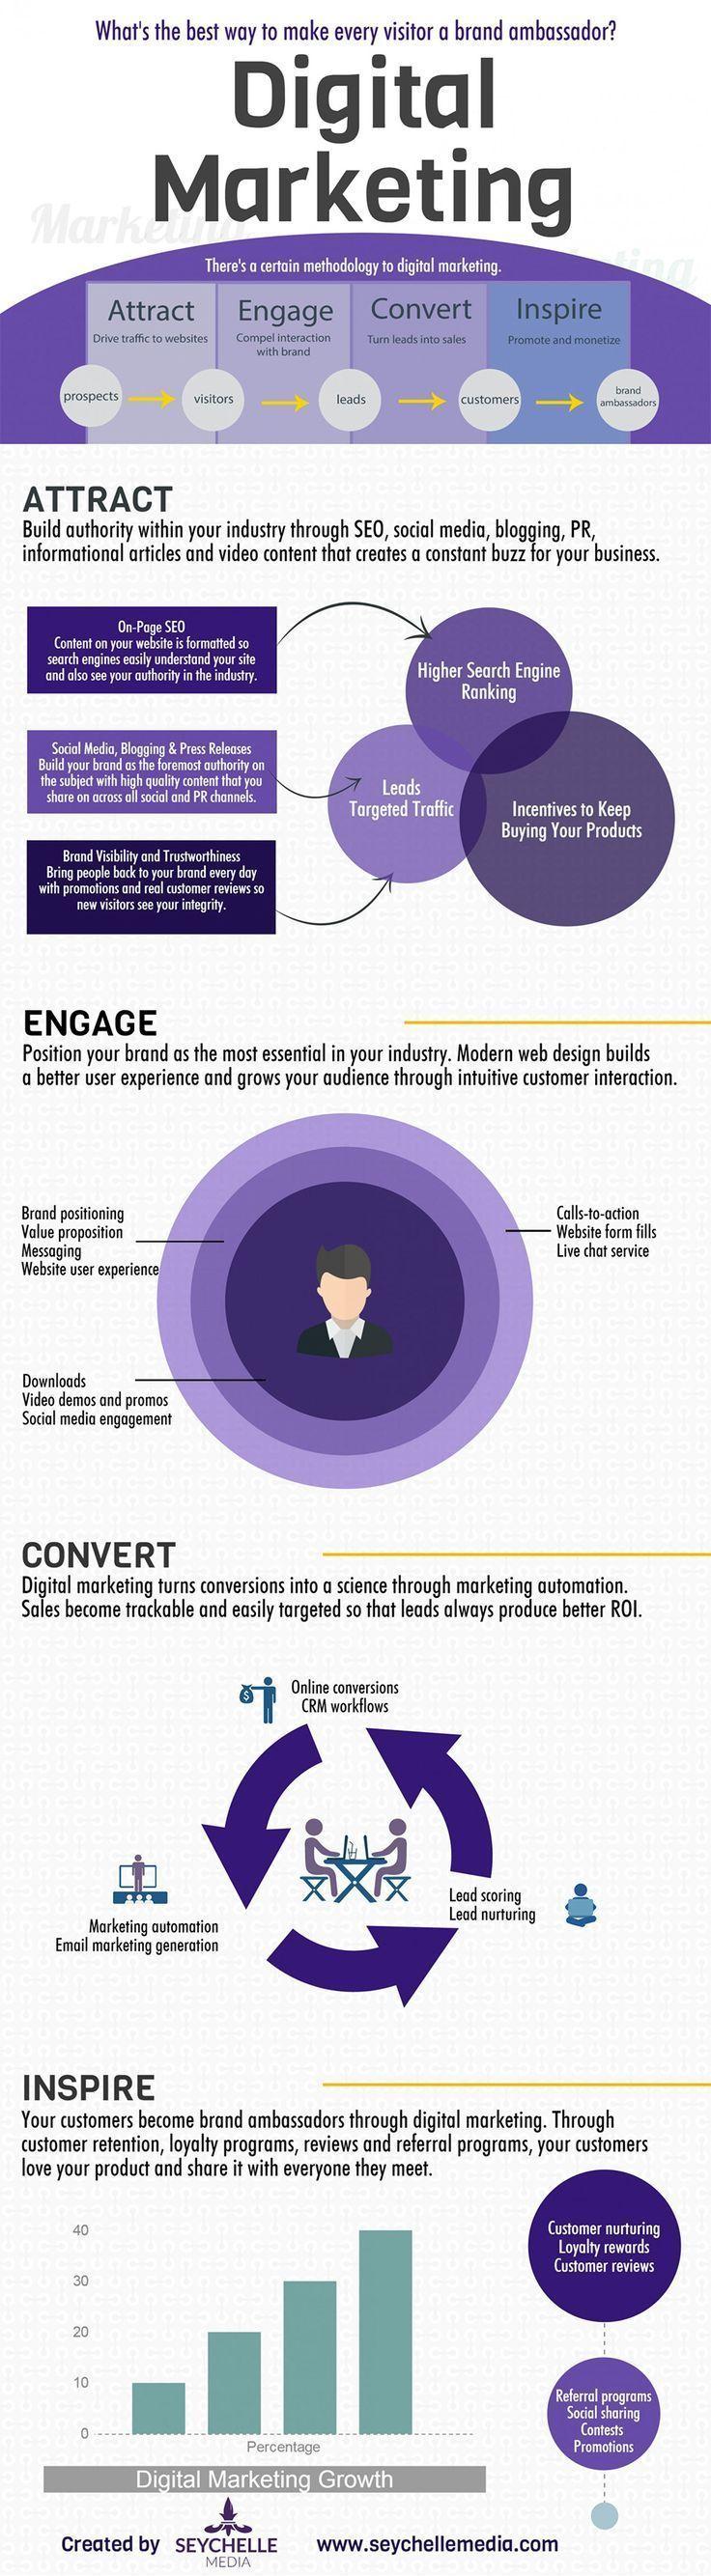 "DIGITAL MARKETING -         ""4 Basic Steps to Turn Web Visitors Into Brand Ambassadors (Infographic)"".  Find more stuff: www.dynamicwebmarketingsecrets.com"